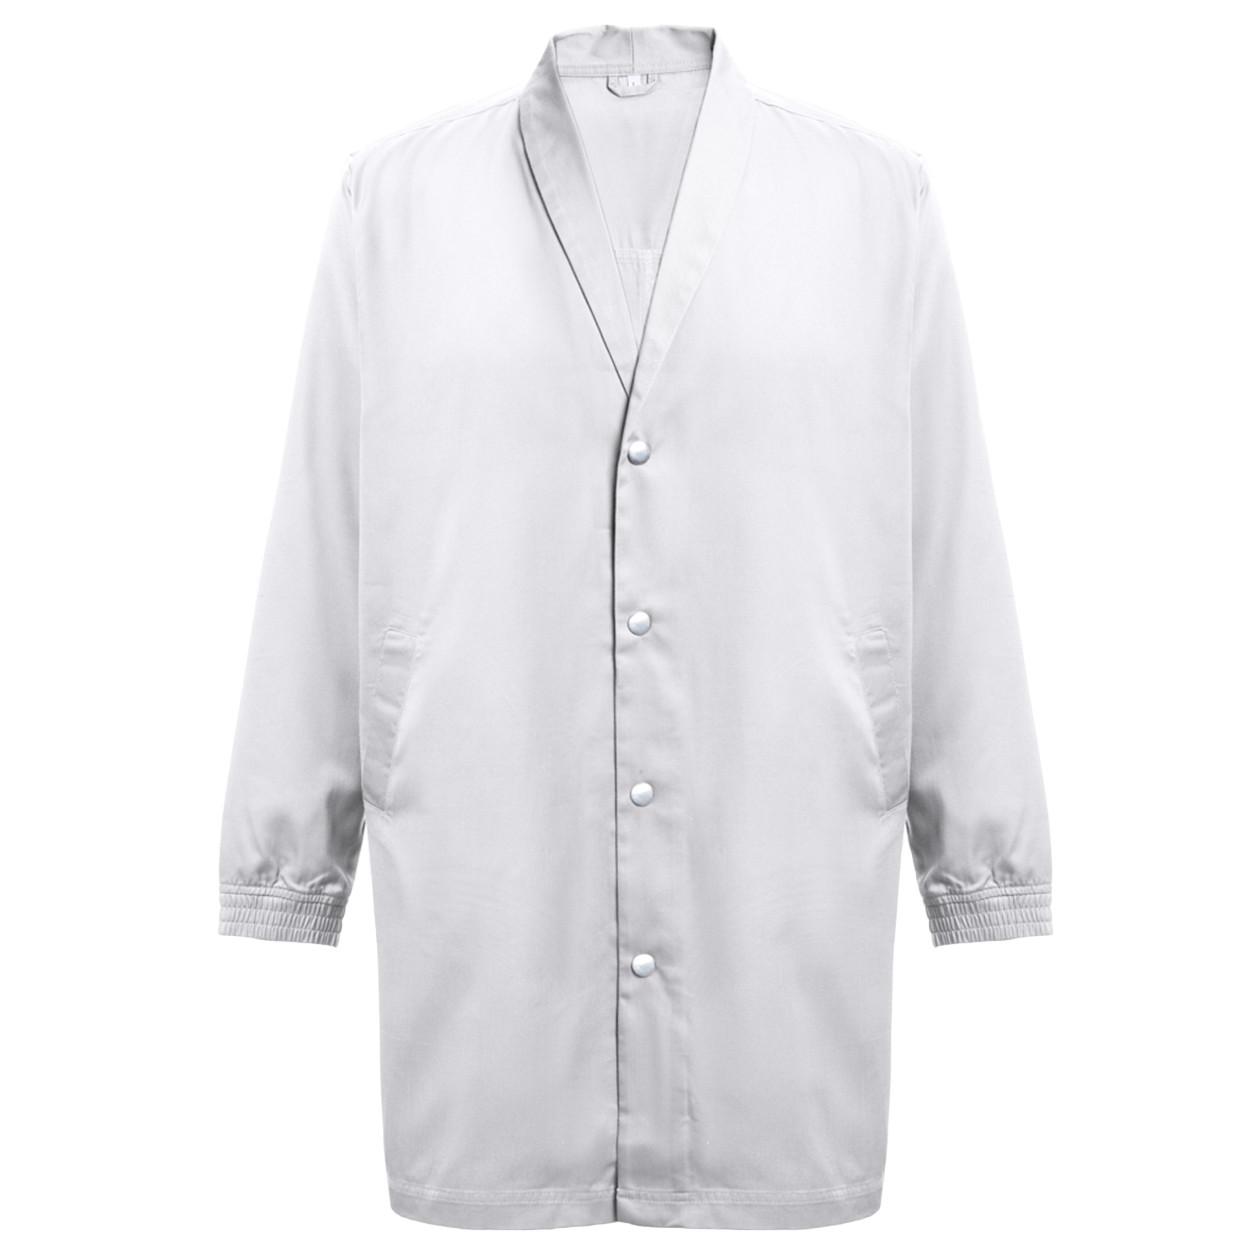 THC MINSK WH. Unisex ρούχα εργασίας - Λευκό / 3XL